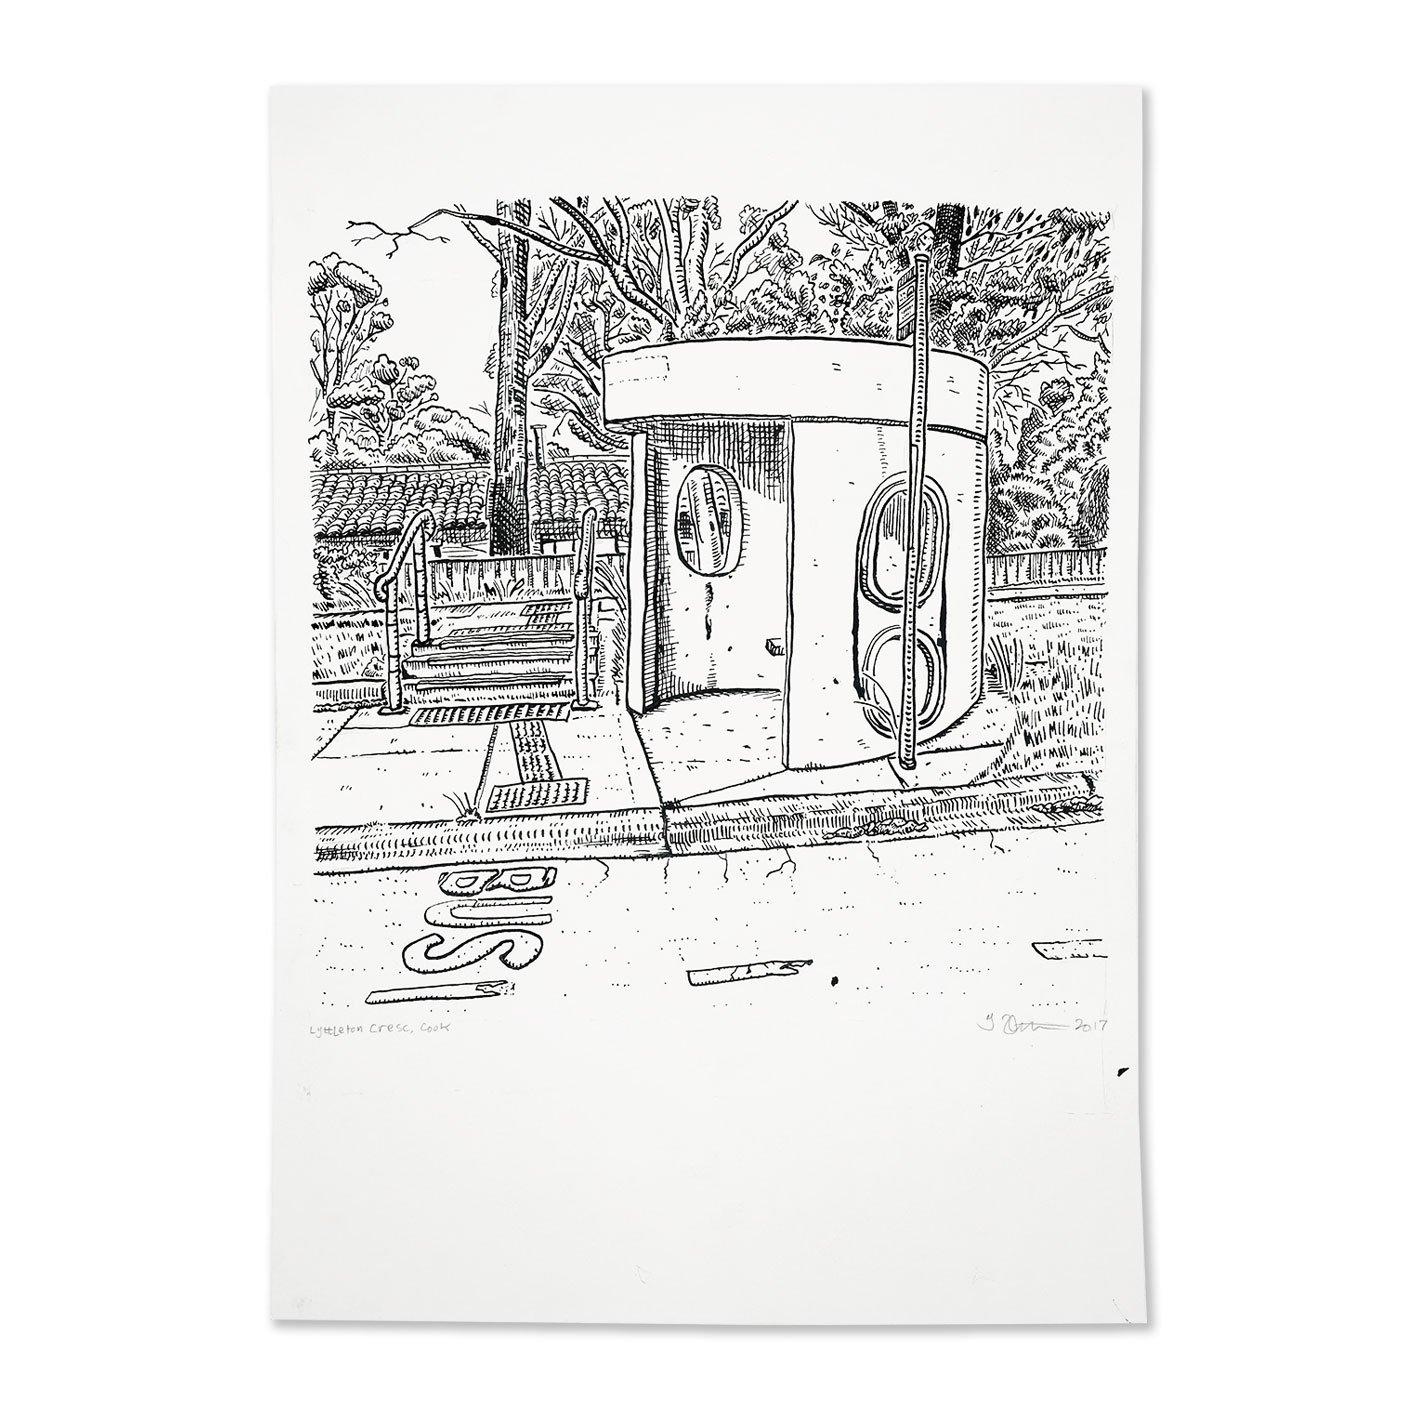 Image of Original Drawing of Cook, Lyttleton Crescent bus shelter